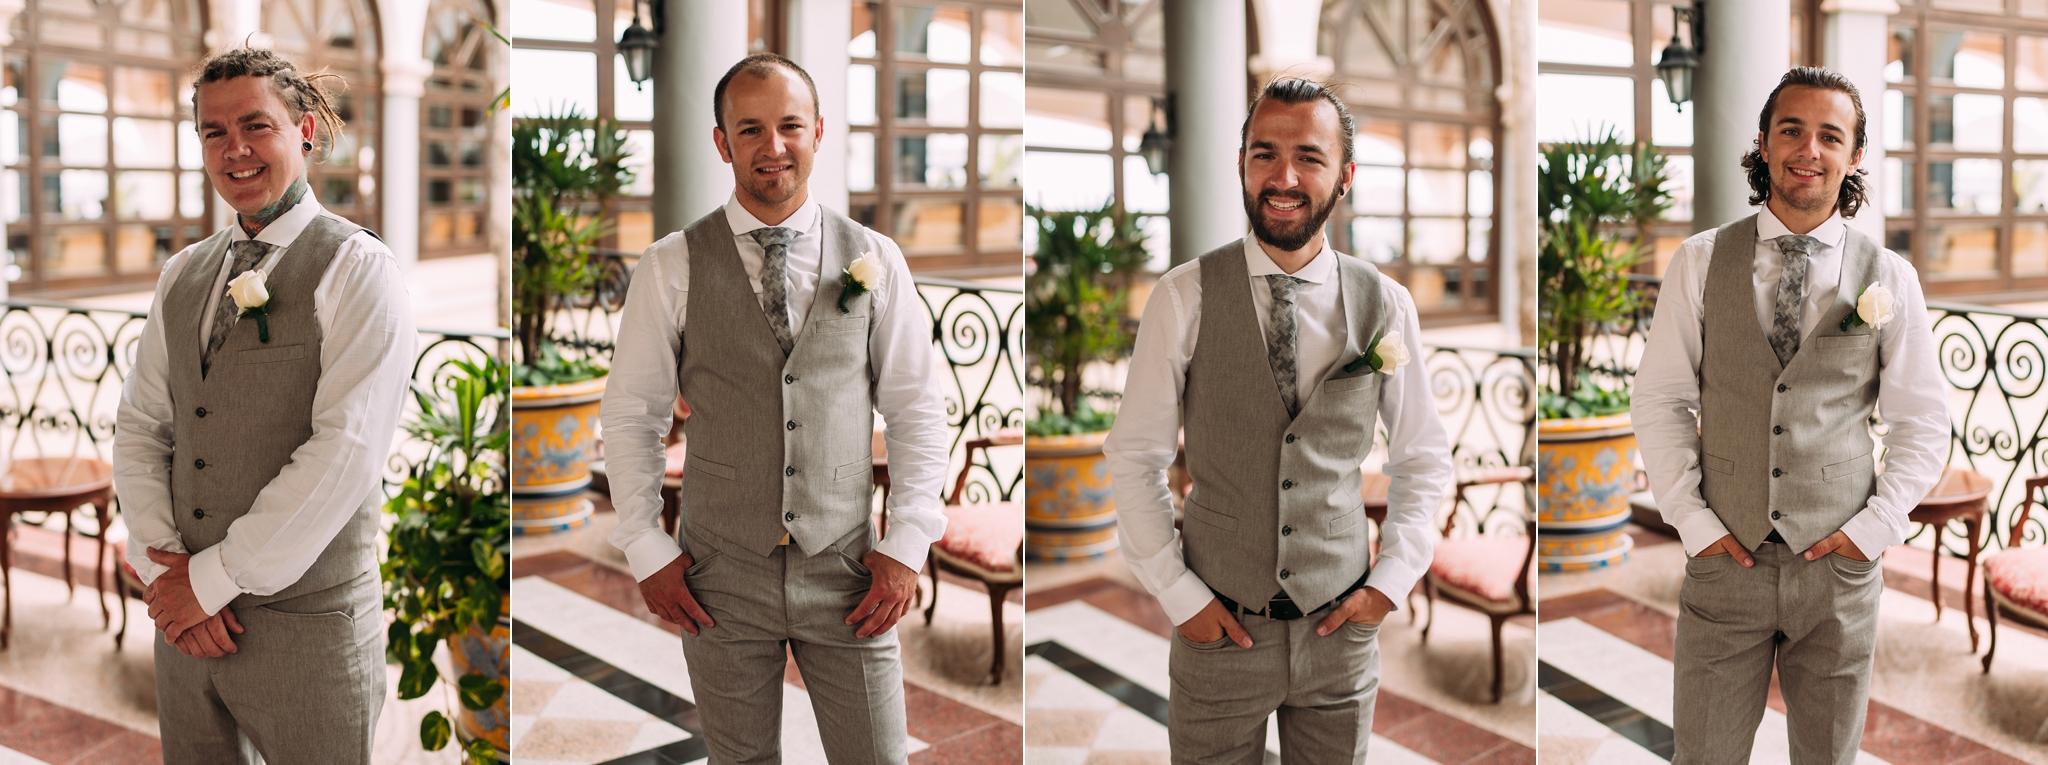 kaihla_tonai_intimate_wedding_elopement_photographer_1357